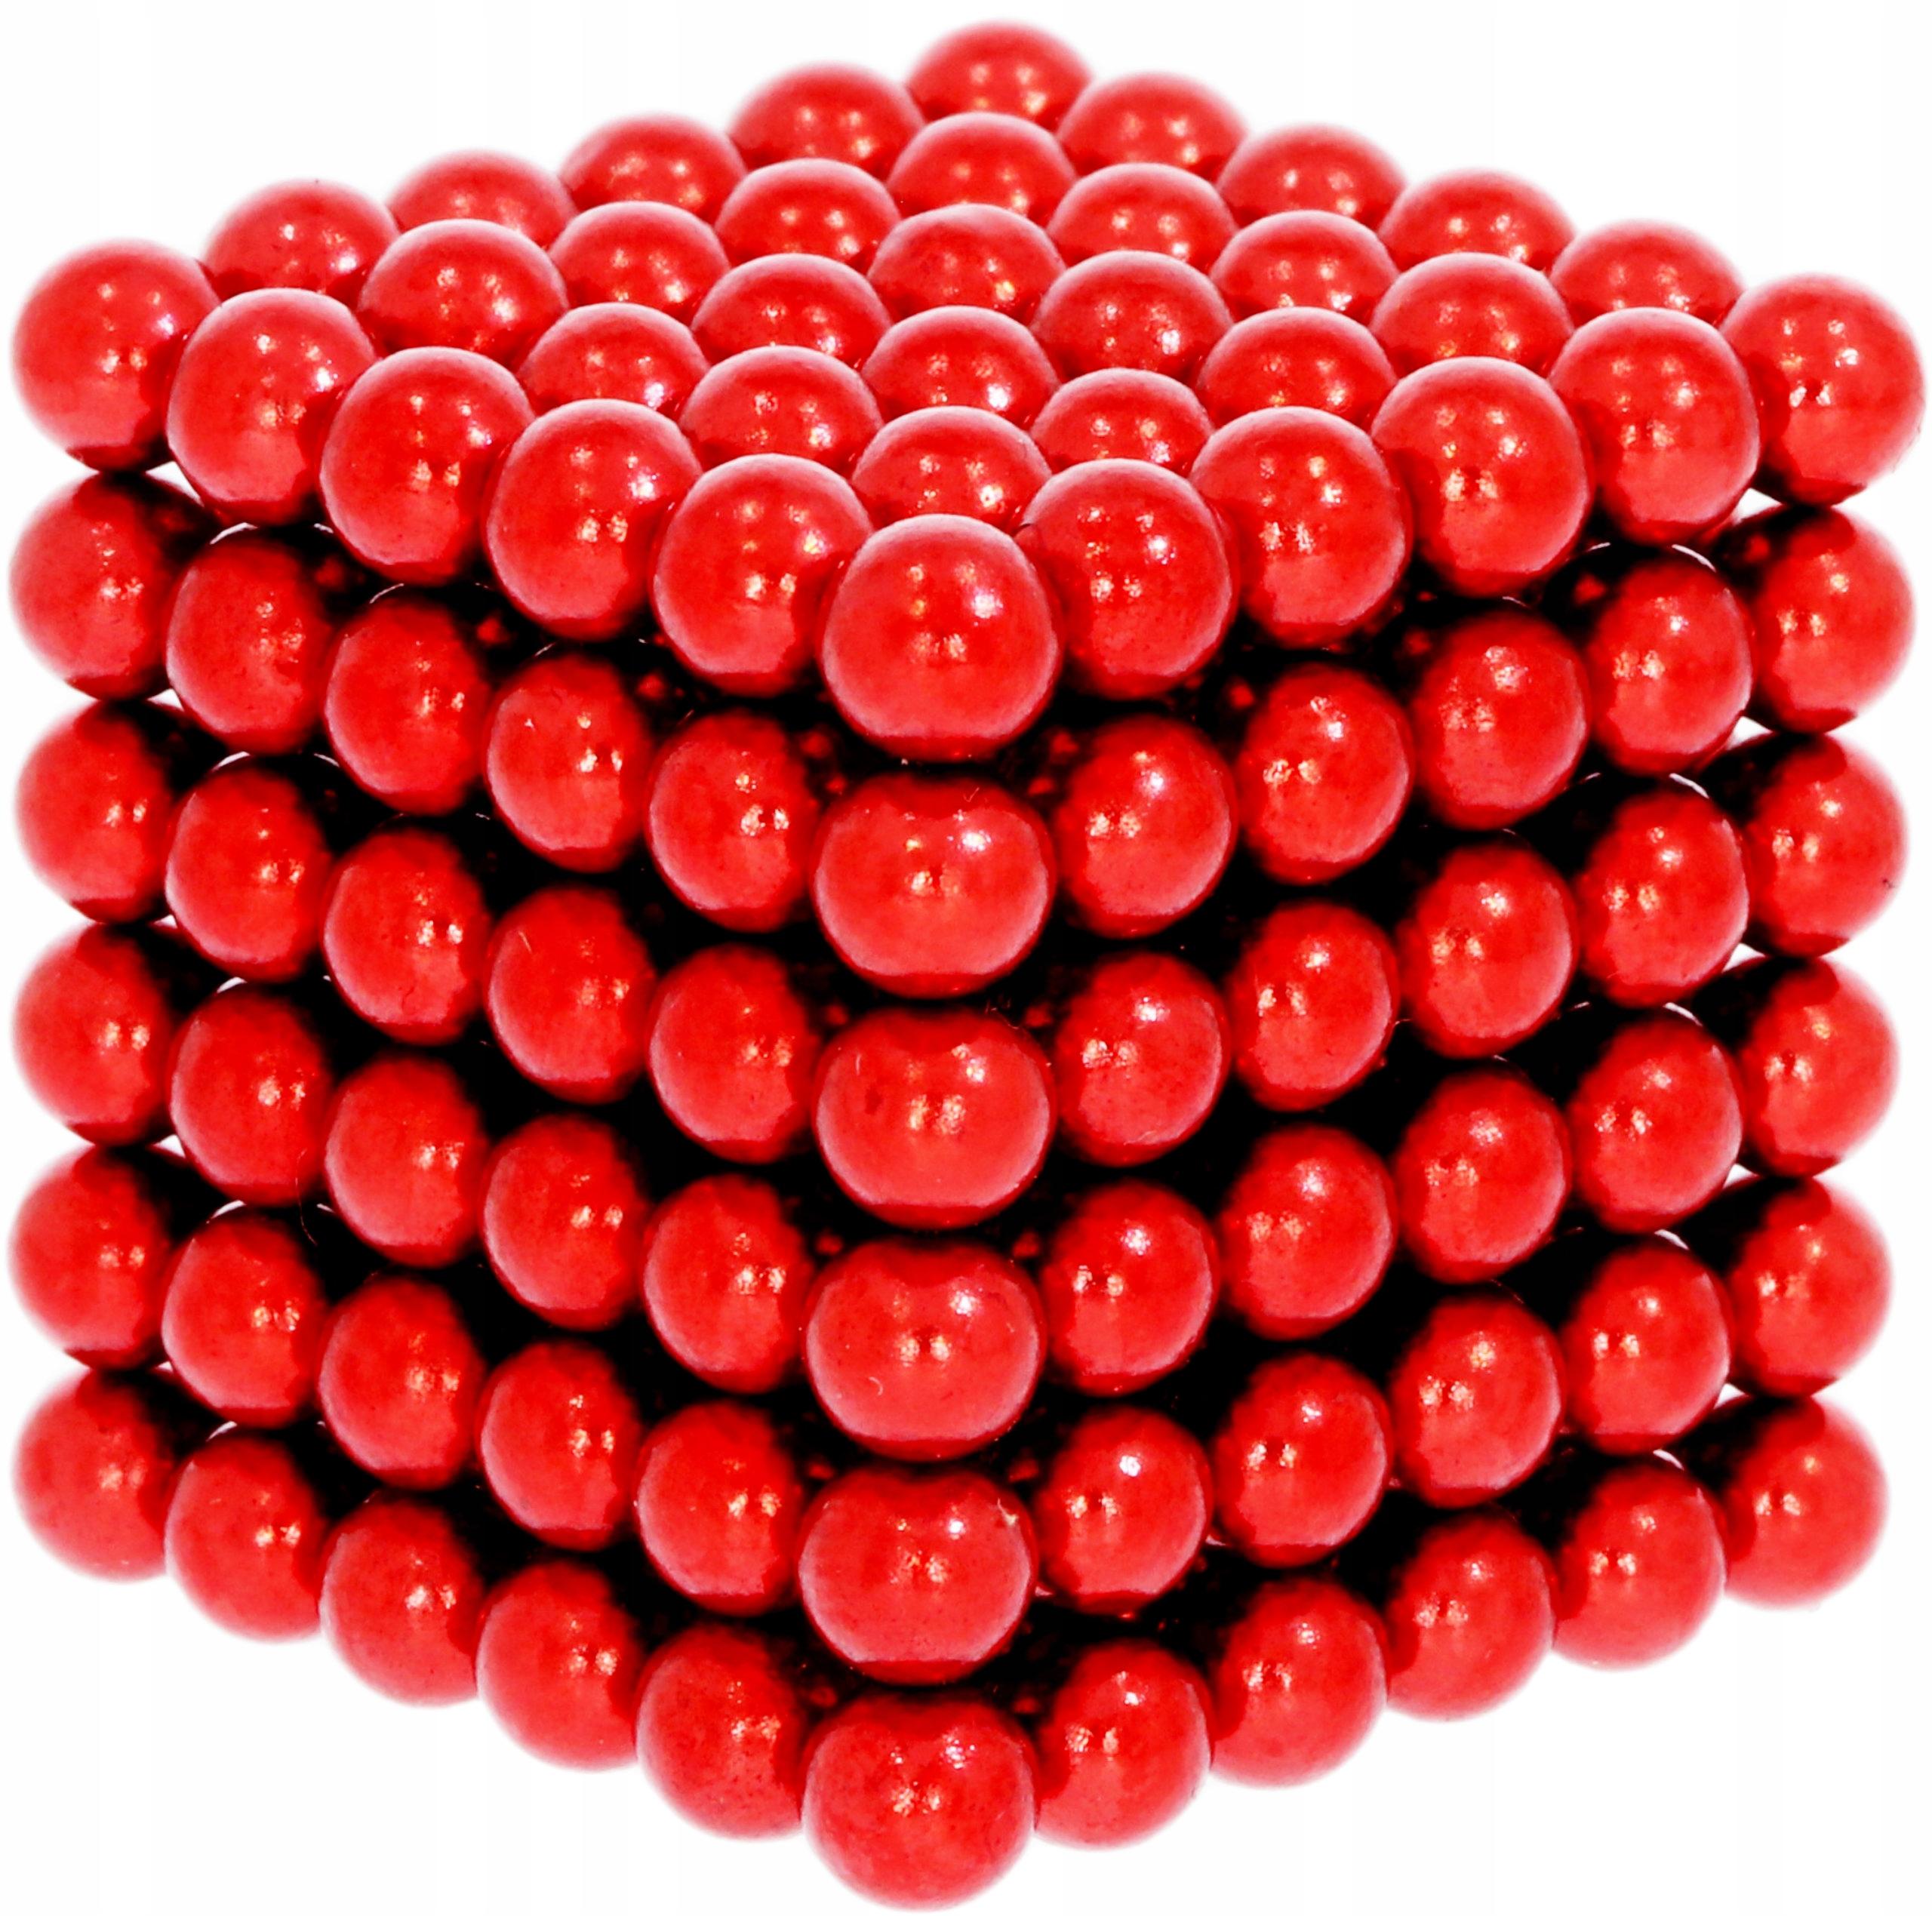 Magnetické guľôčky NeoCube 216 ks, 5 mm, červená!